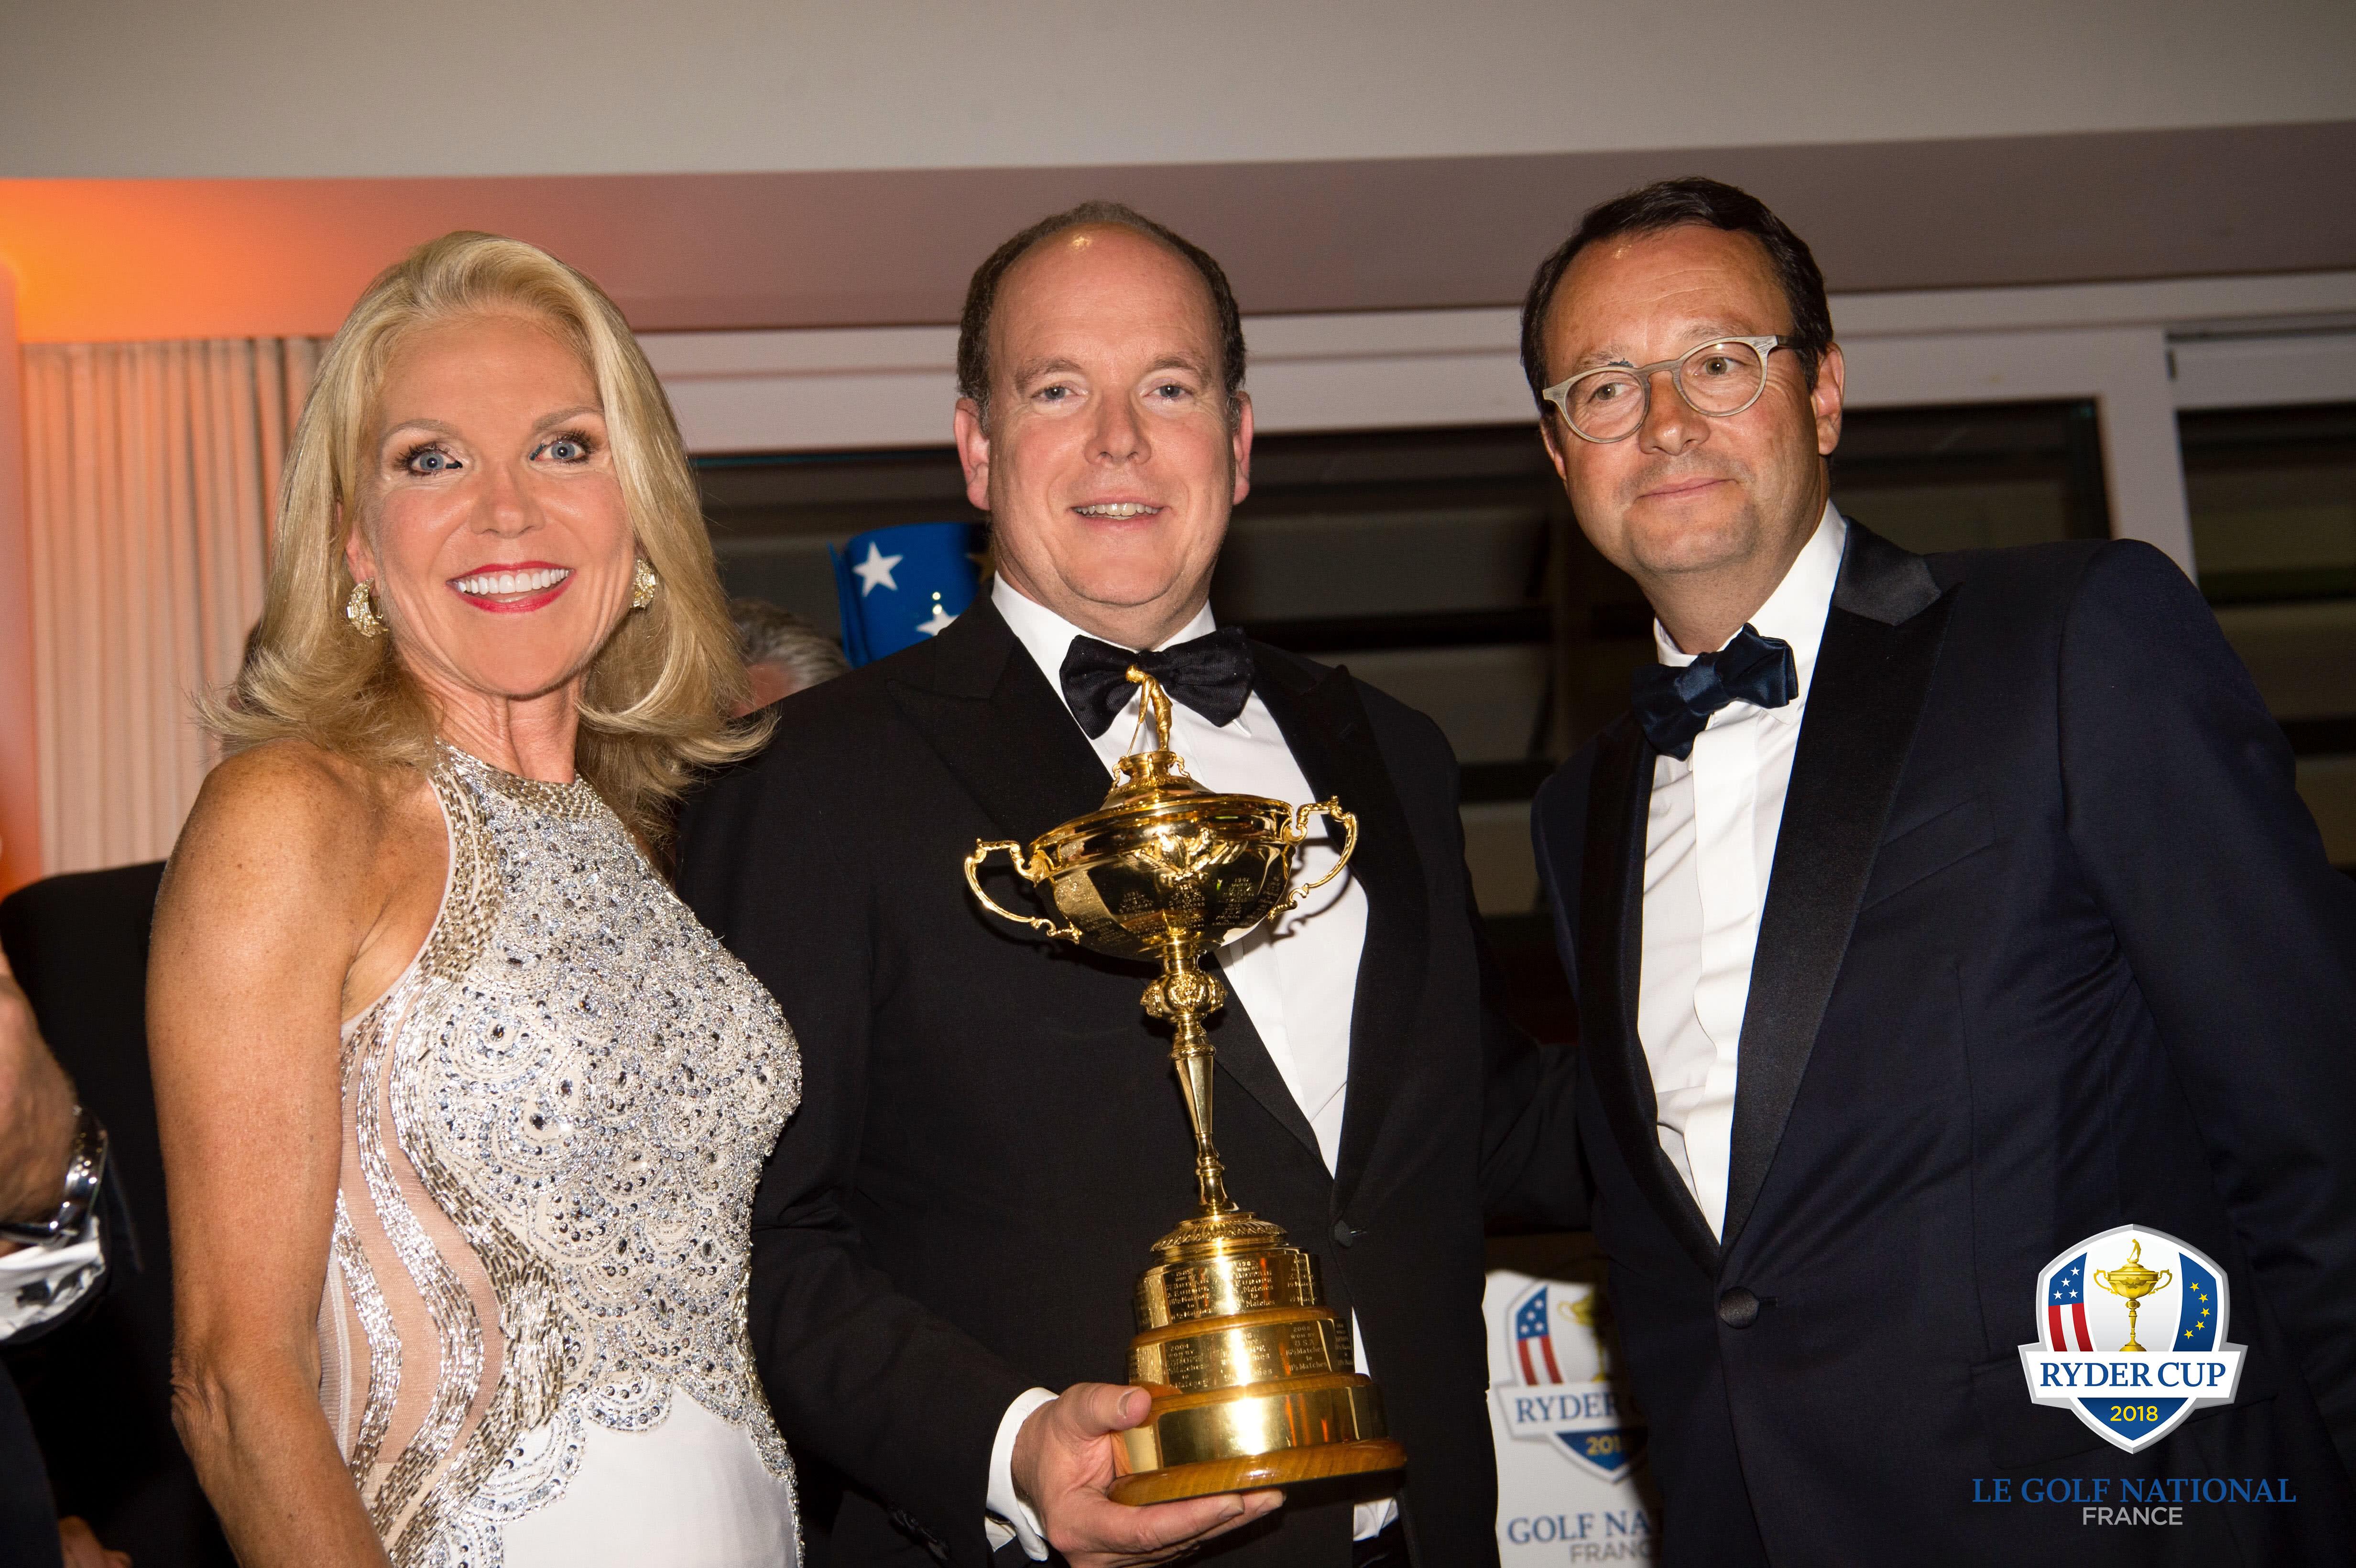 Madame Susan Feaster, SAS Prince Albert II de Monaco et Pascal Grizot Credit Photo Pascale Bayle